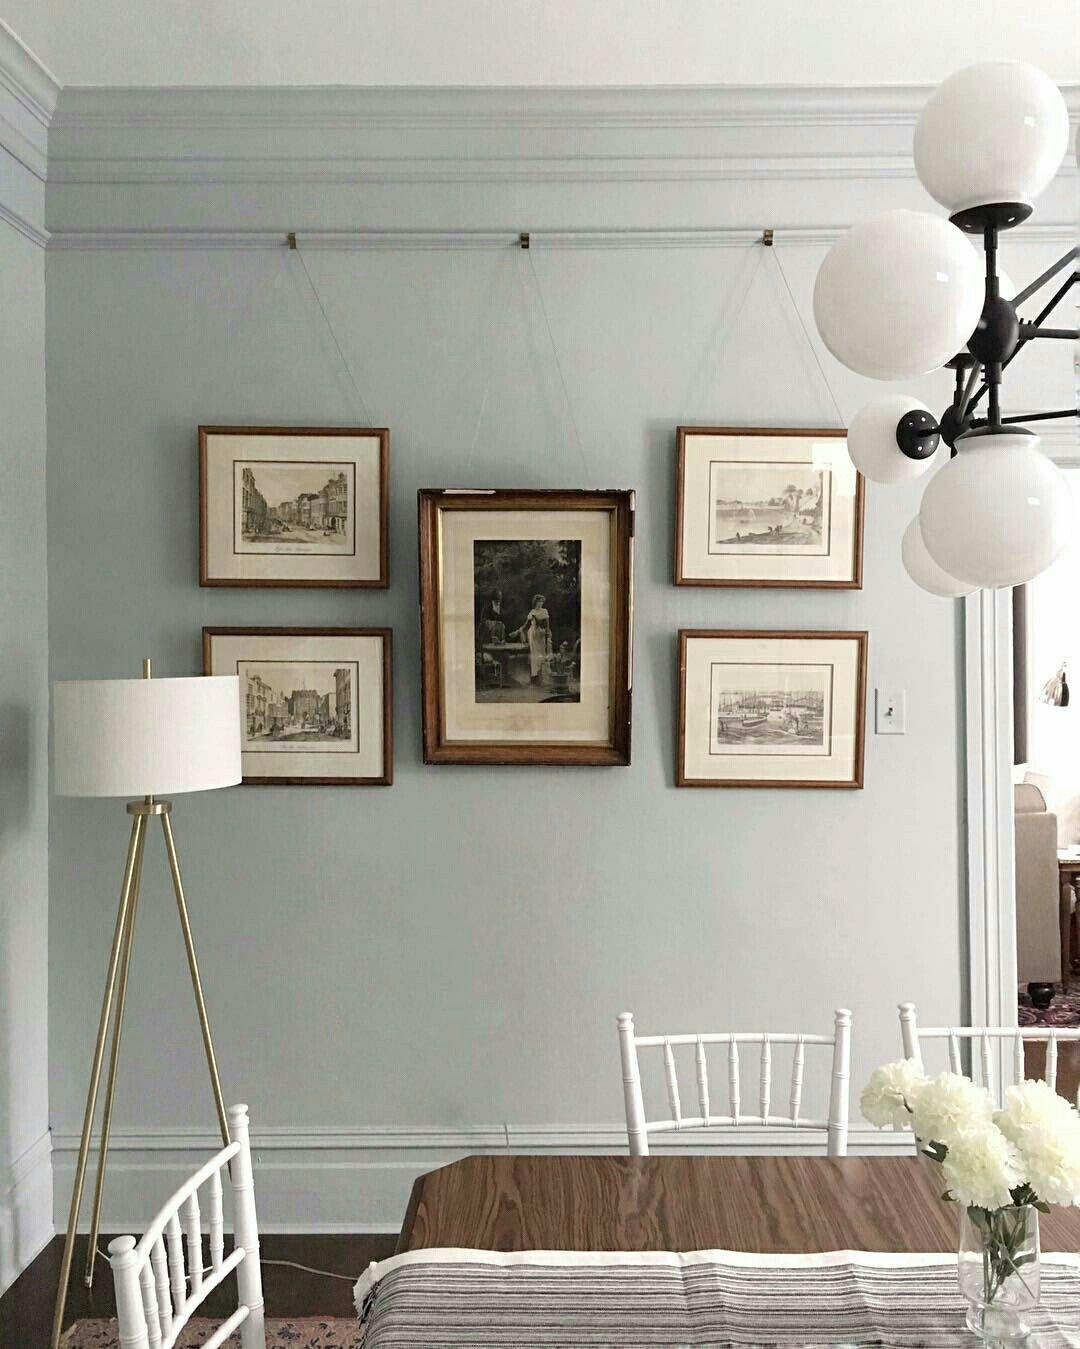 Picture Rail Painting Ideas: @oldhomelove Paint: Soft Silver Sage By Valspar